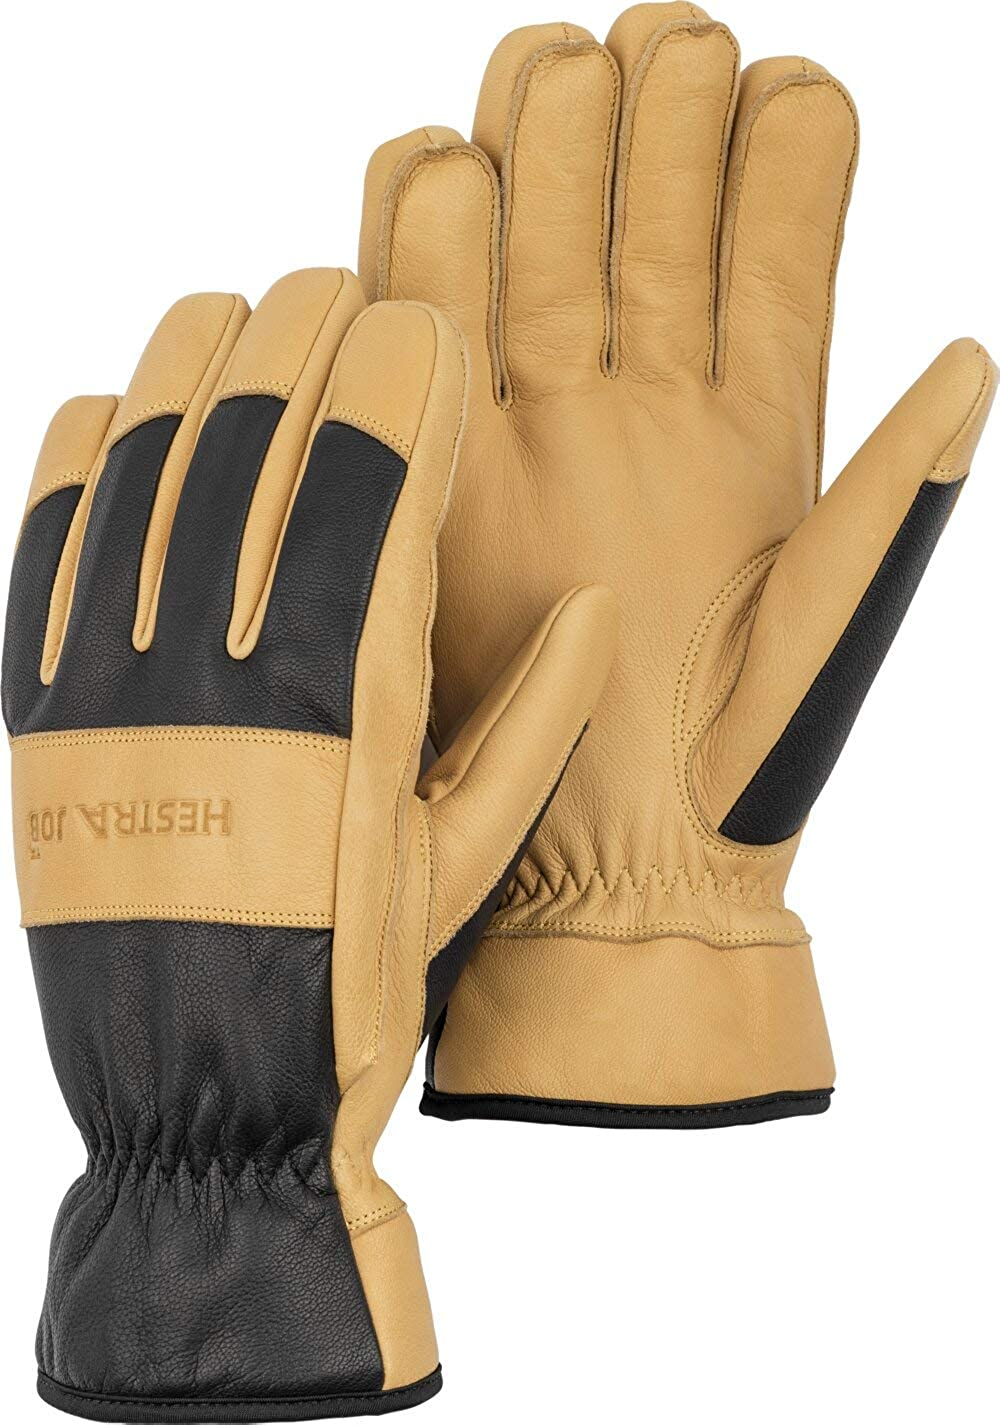 HESTRA 73040-701-09 Glove,Leather,Goatskin,Black//Tan,L